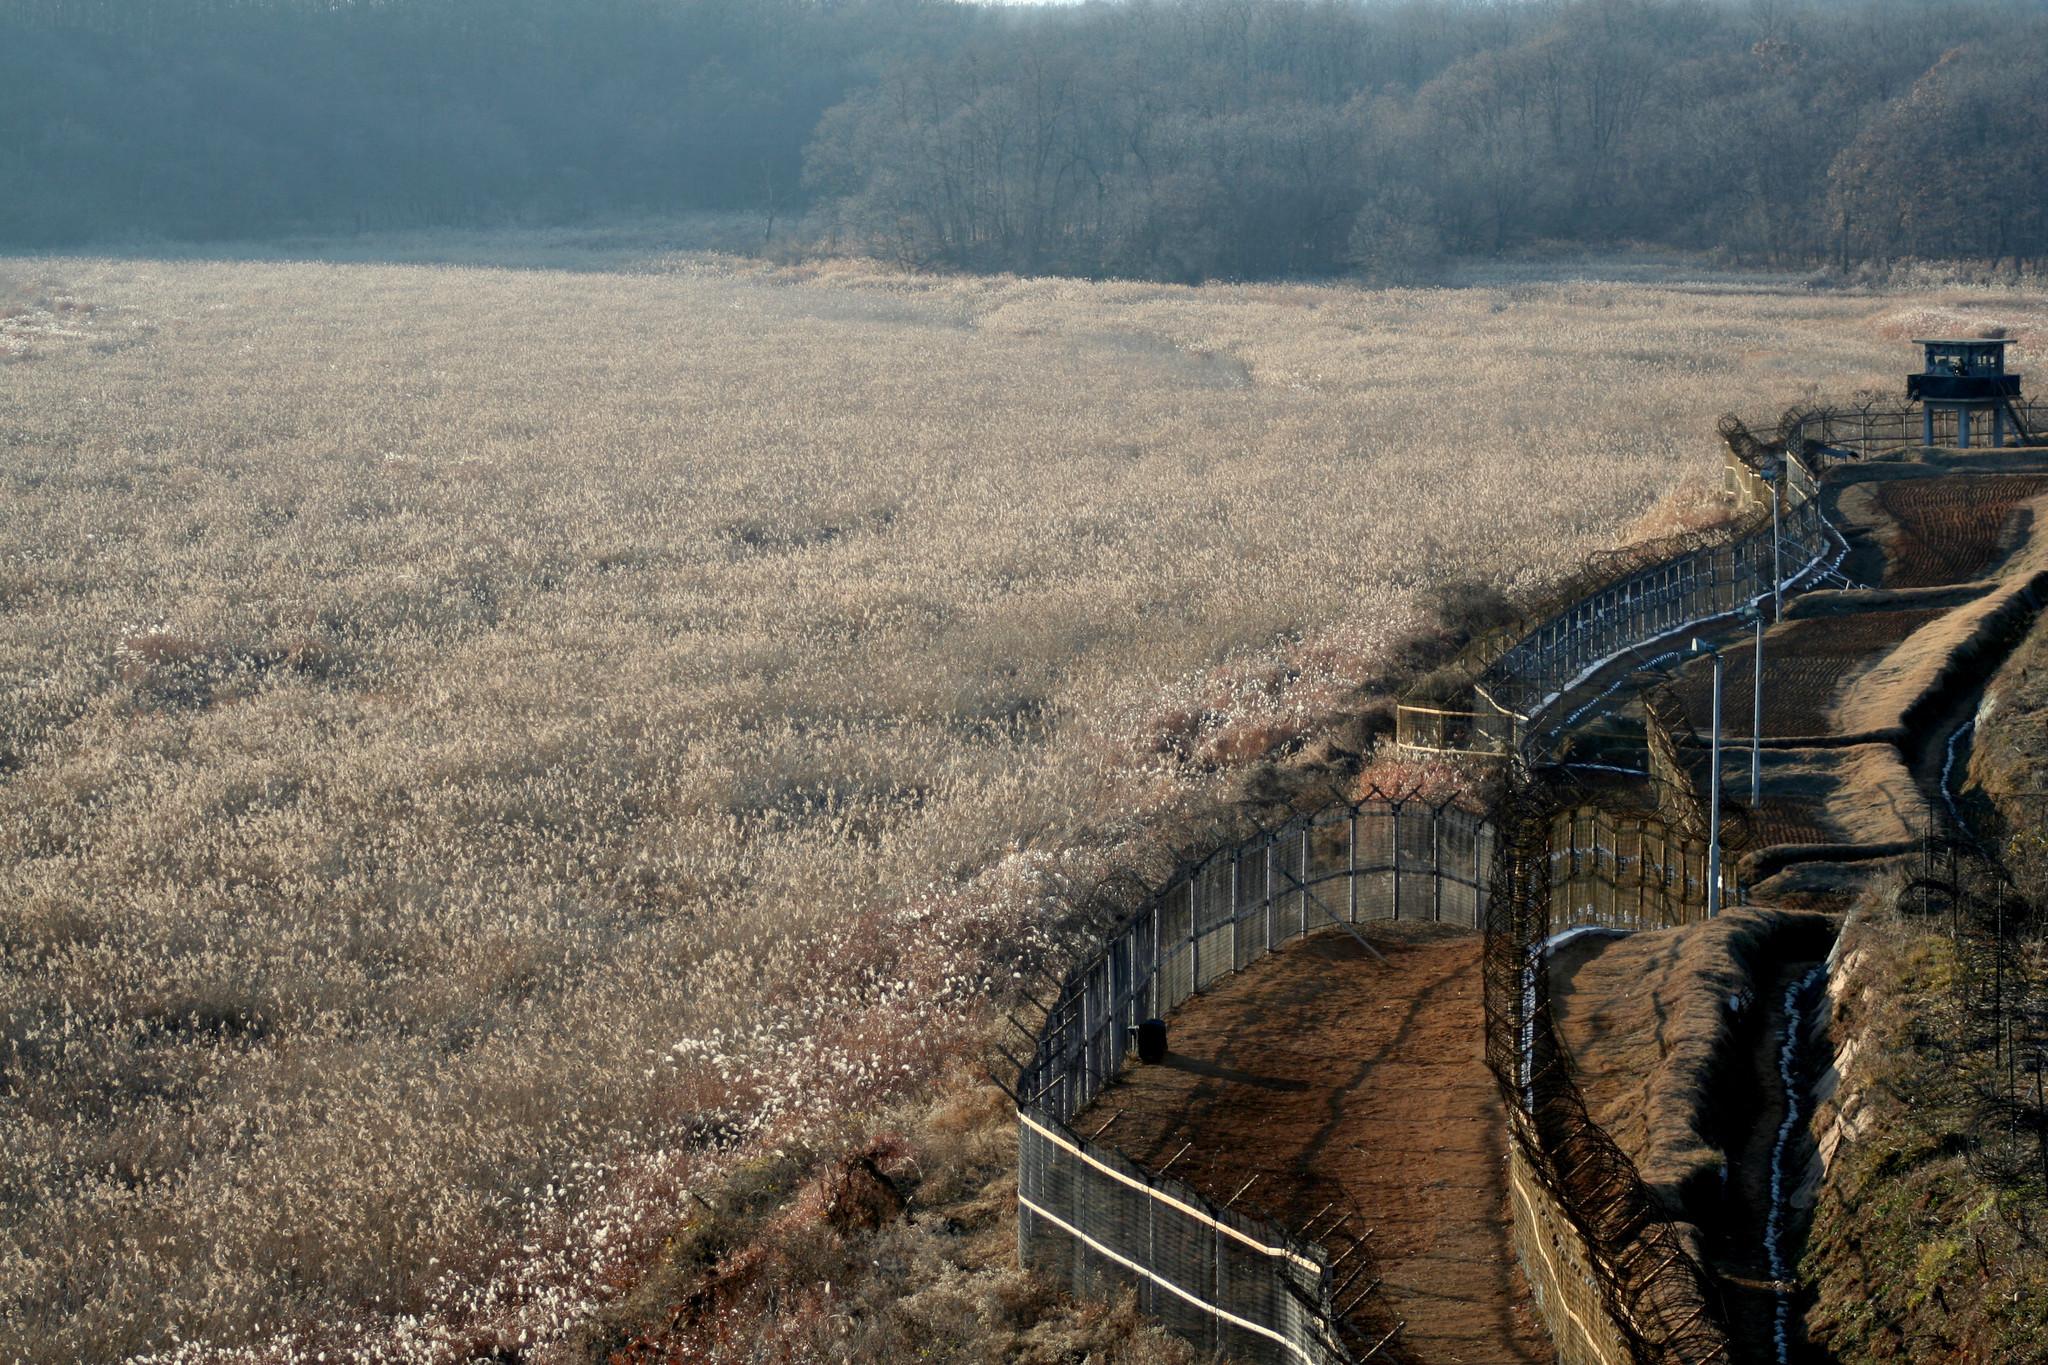 The southern edge of the Demilitarized Zone, South Korean military guard post near Cheorwon, South Korea